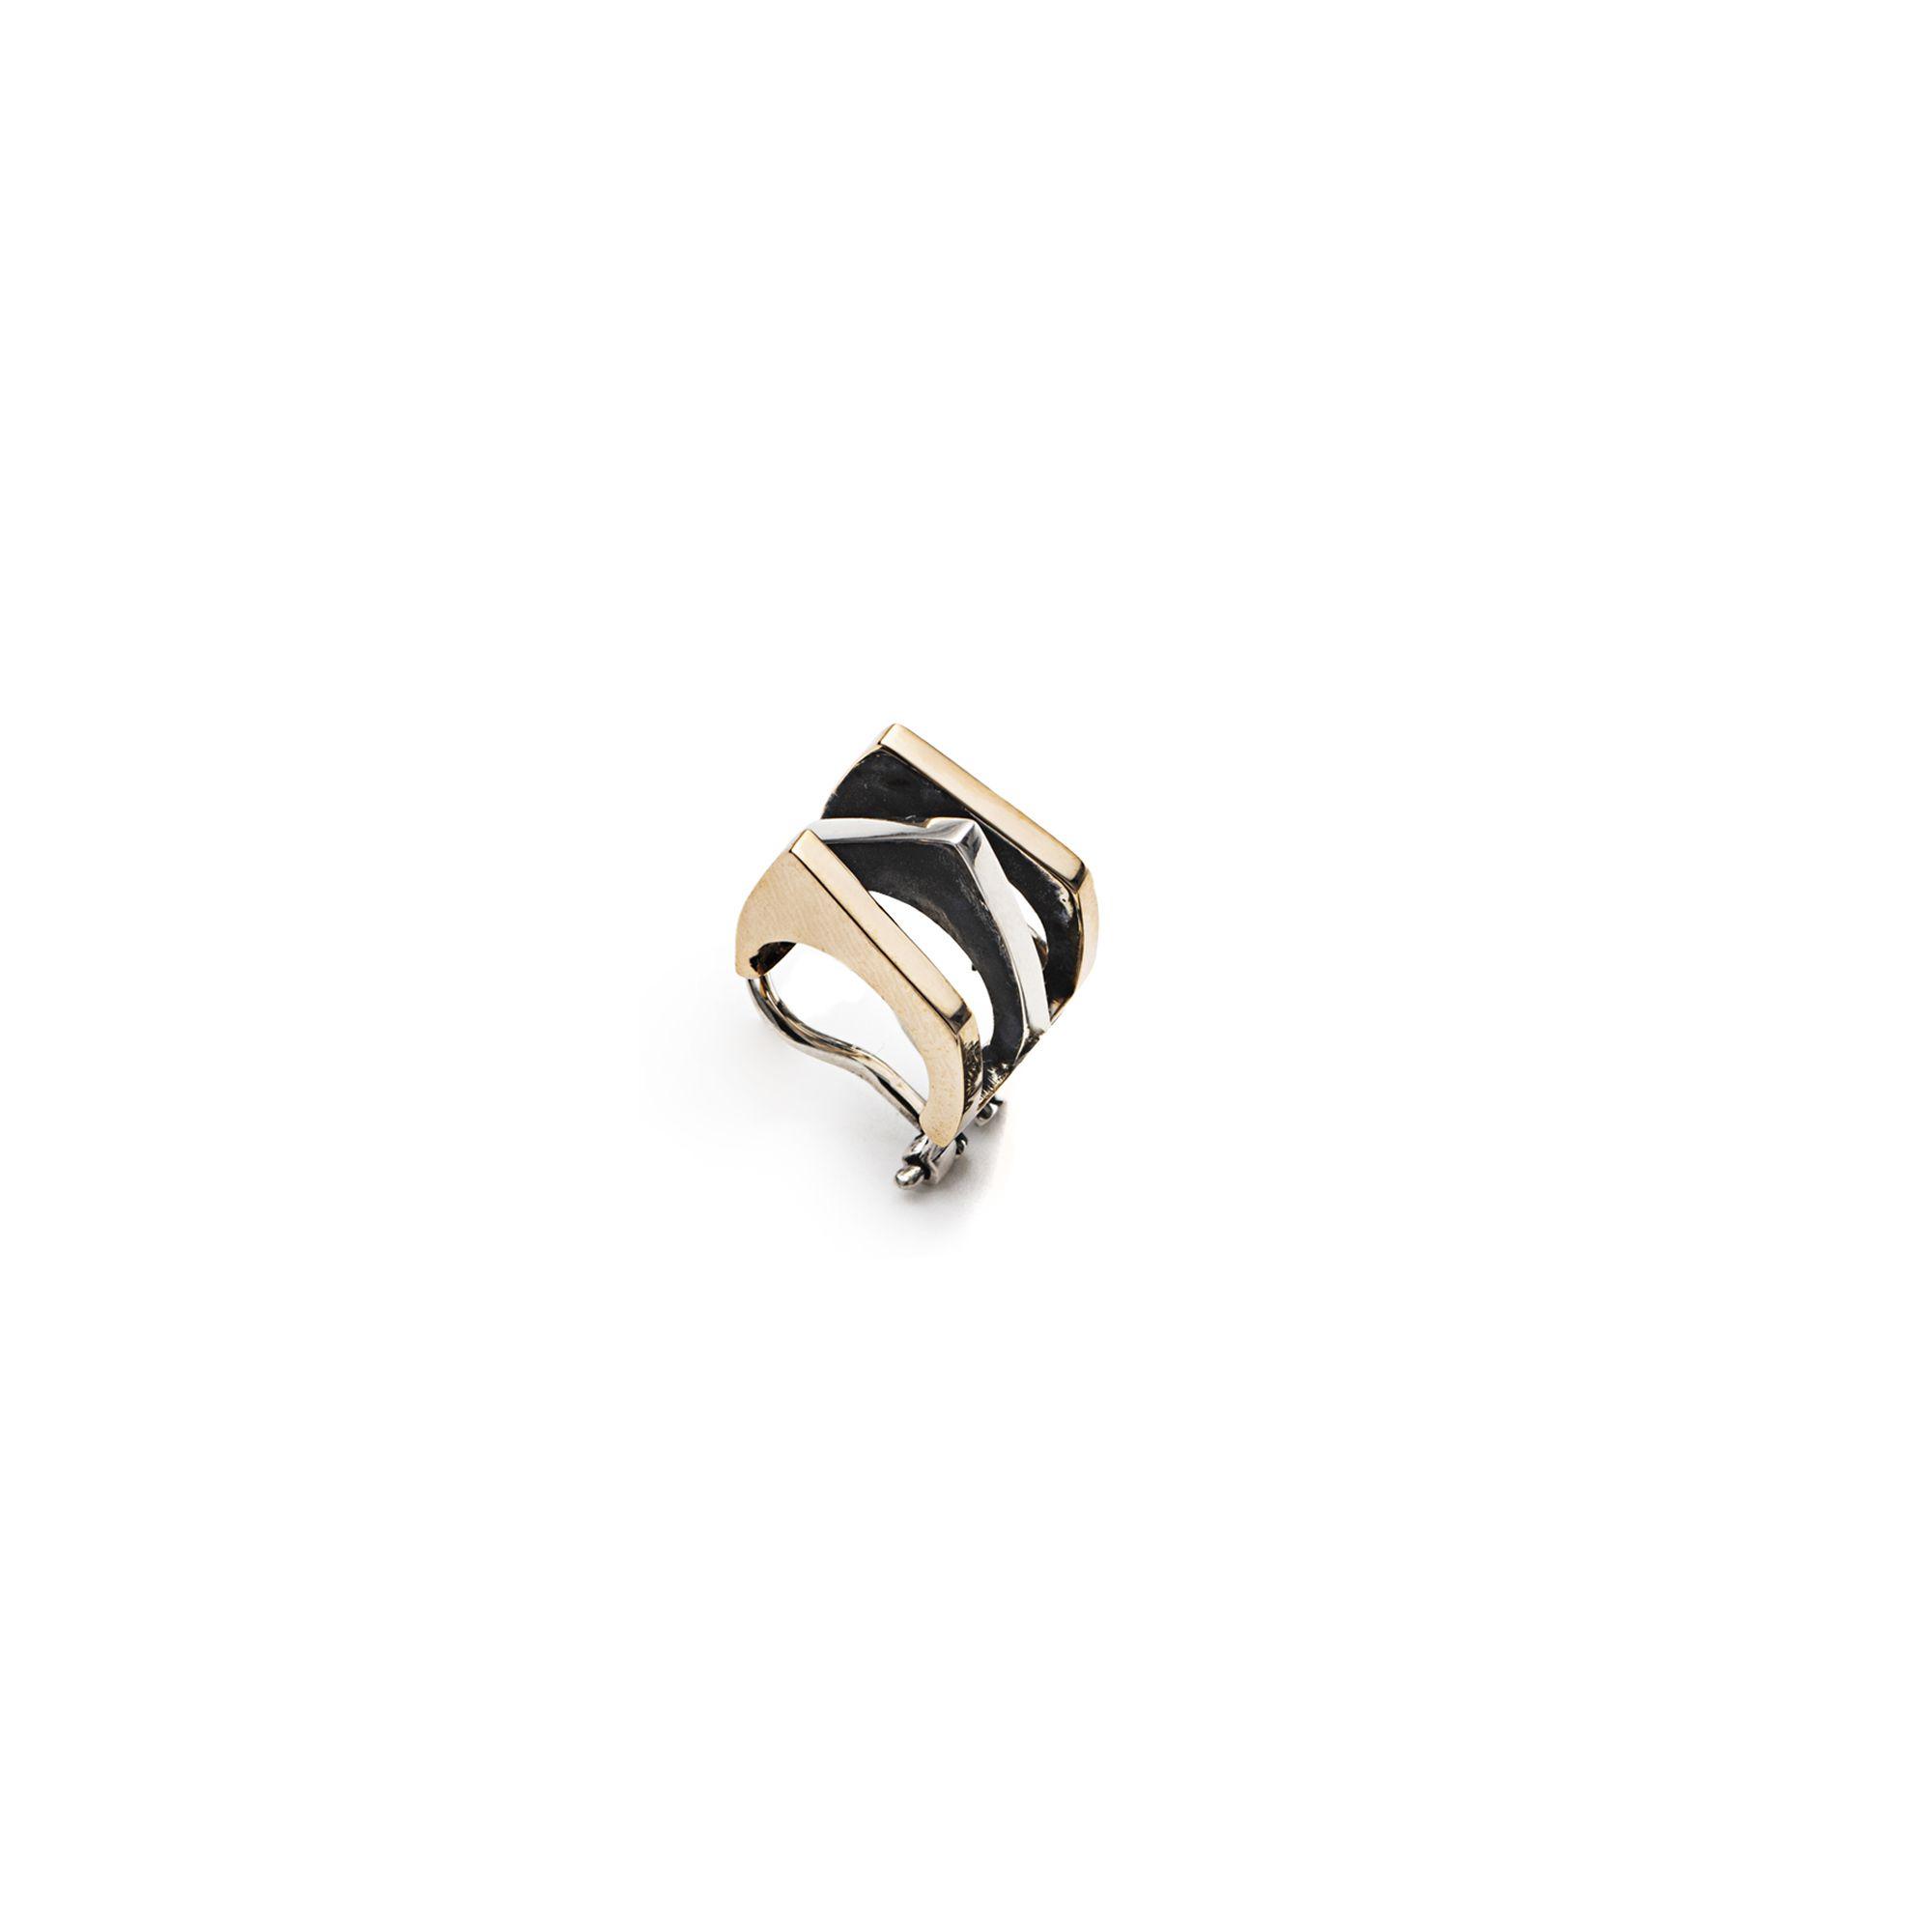 3-element 'Congiunzioni' ear cuff Mono earring for cartilage in silver and bronze